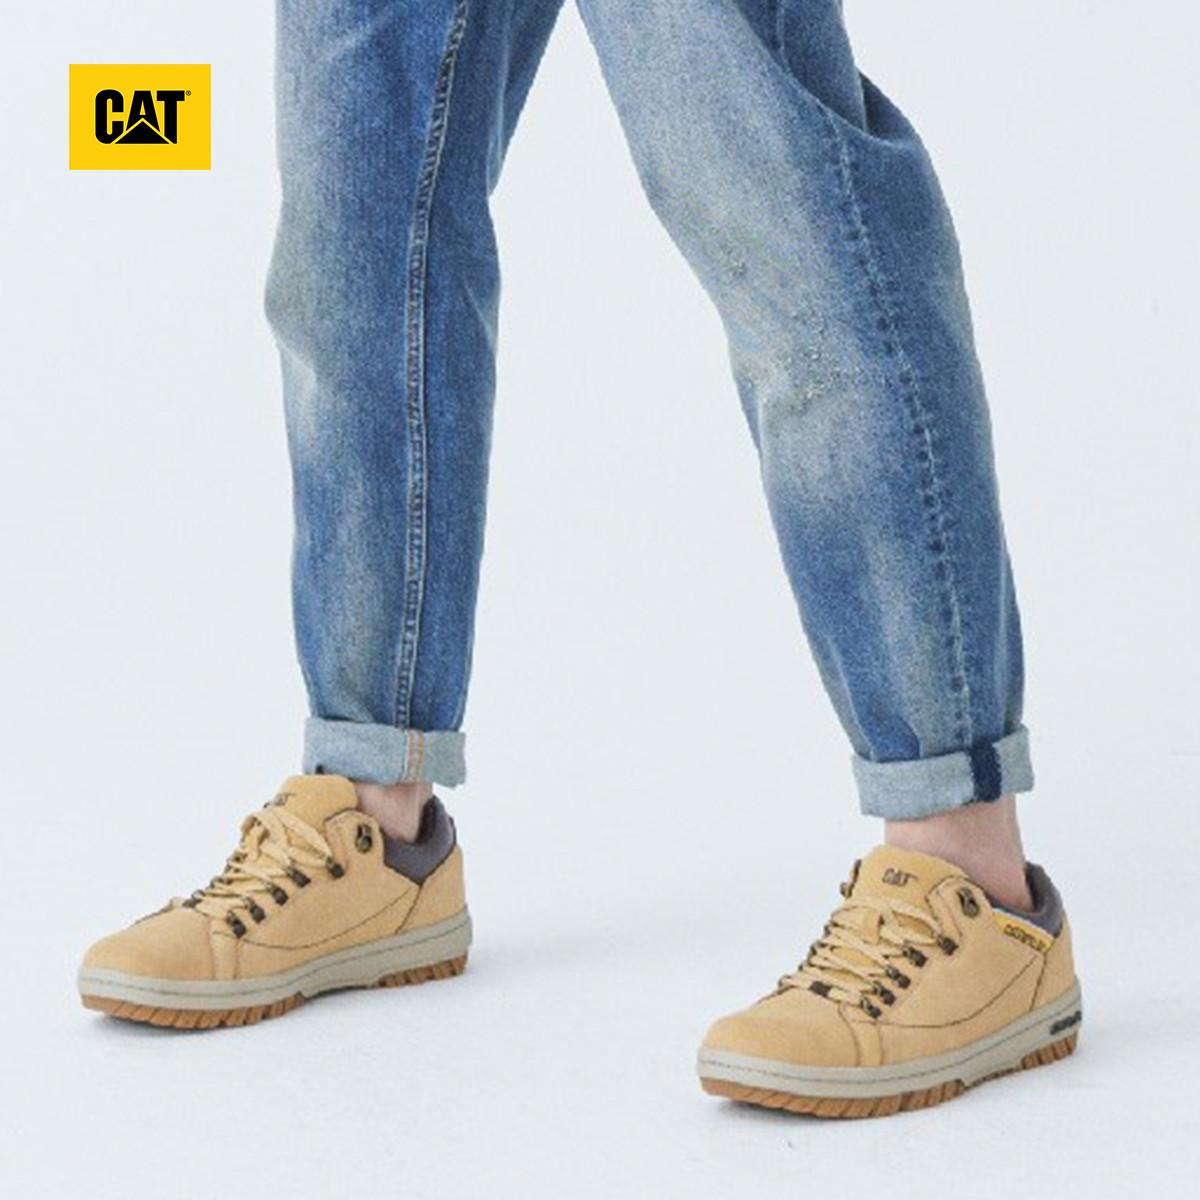 CAT 卡特彼勒 P711588J3EMC25 男士休闲鞋